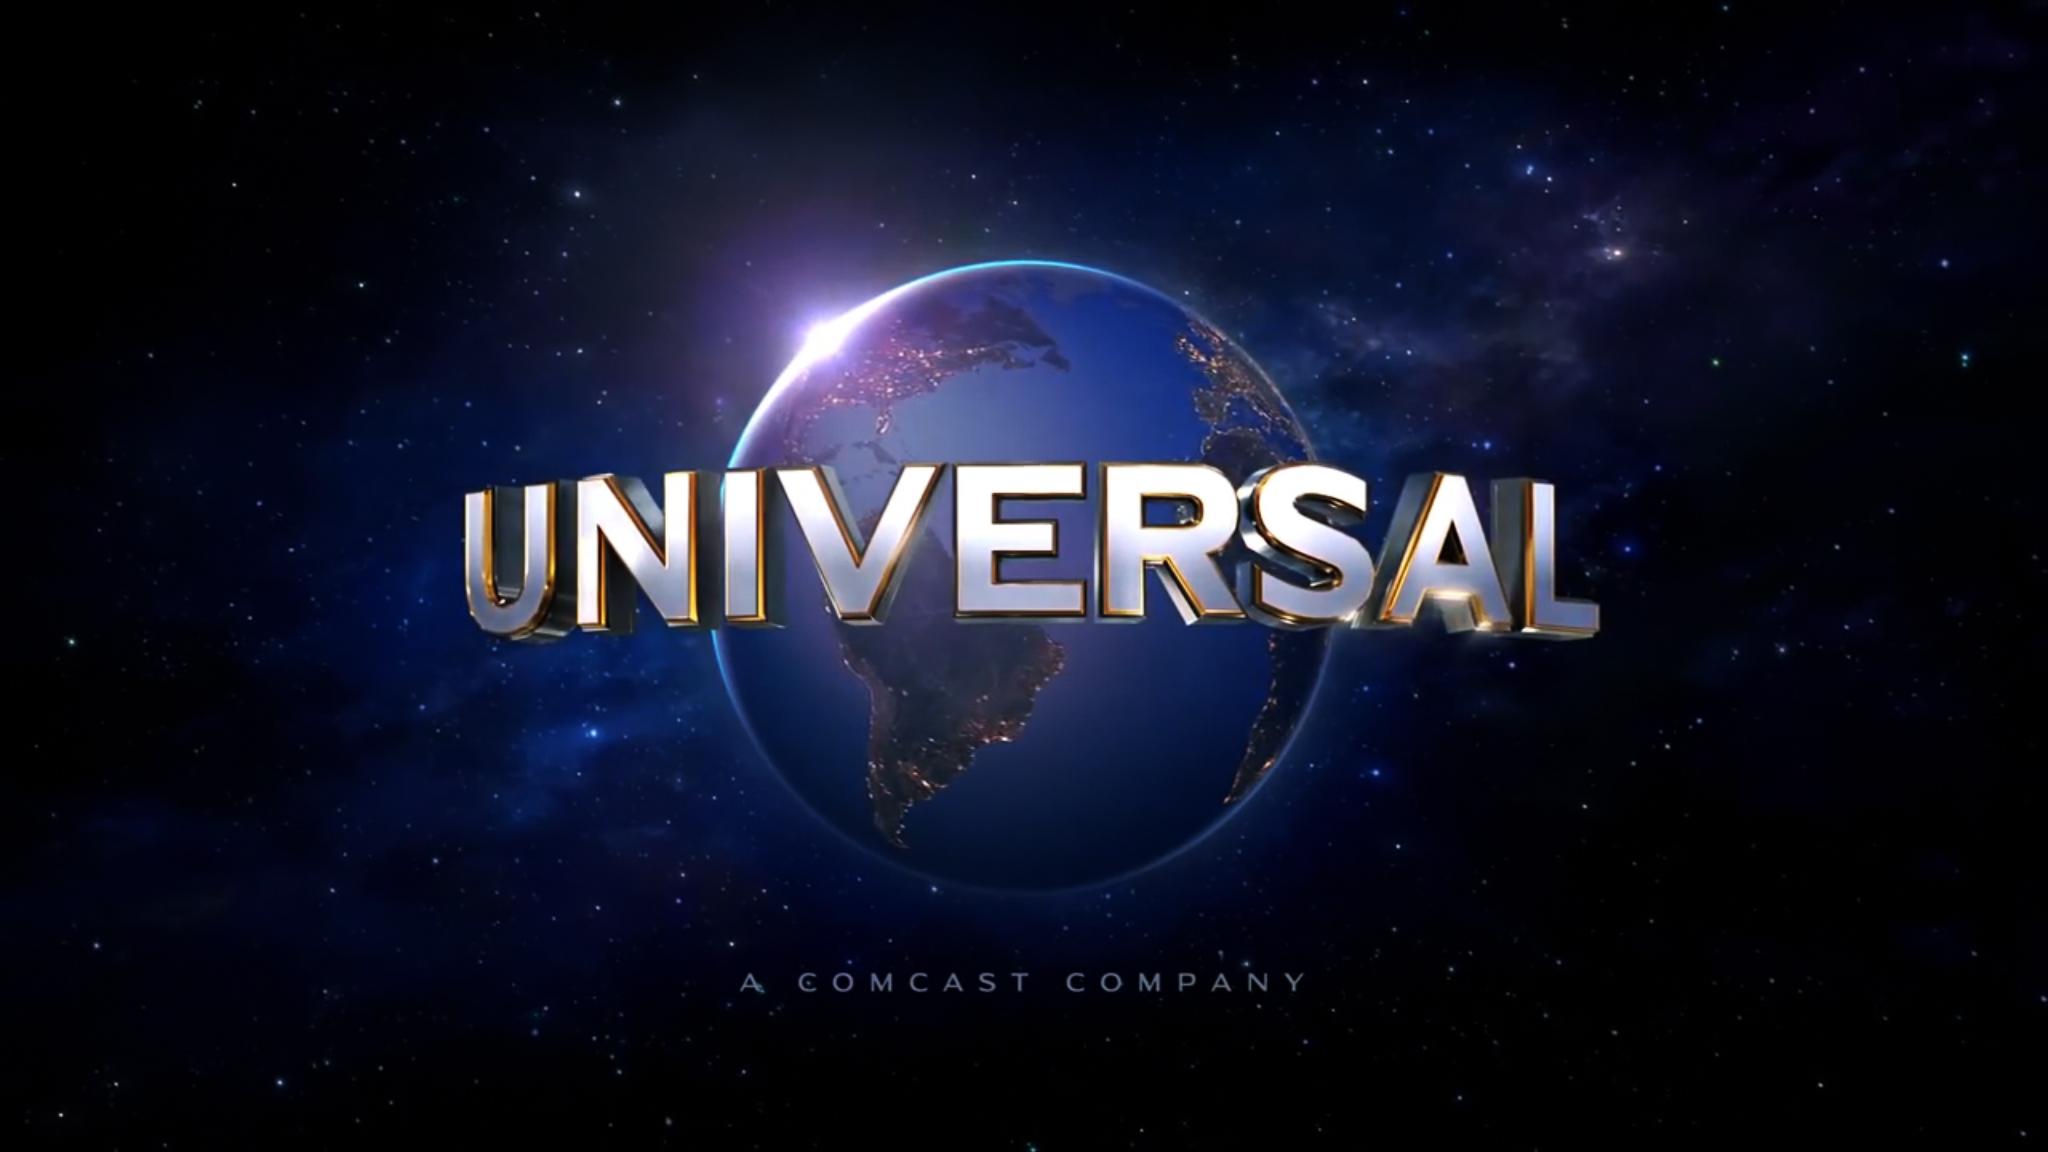 DARK_UNI_01_UNIVERSAL_v06a_AK_HD copy.jpg